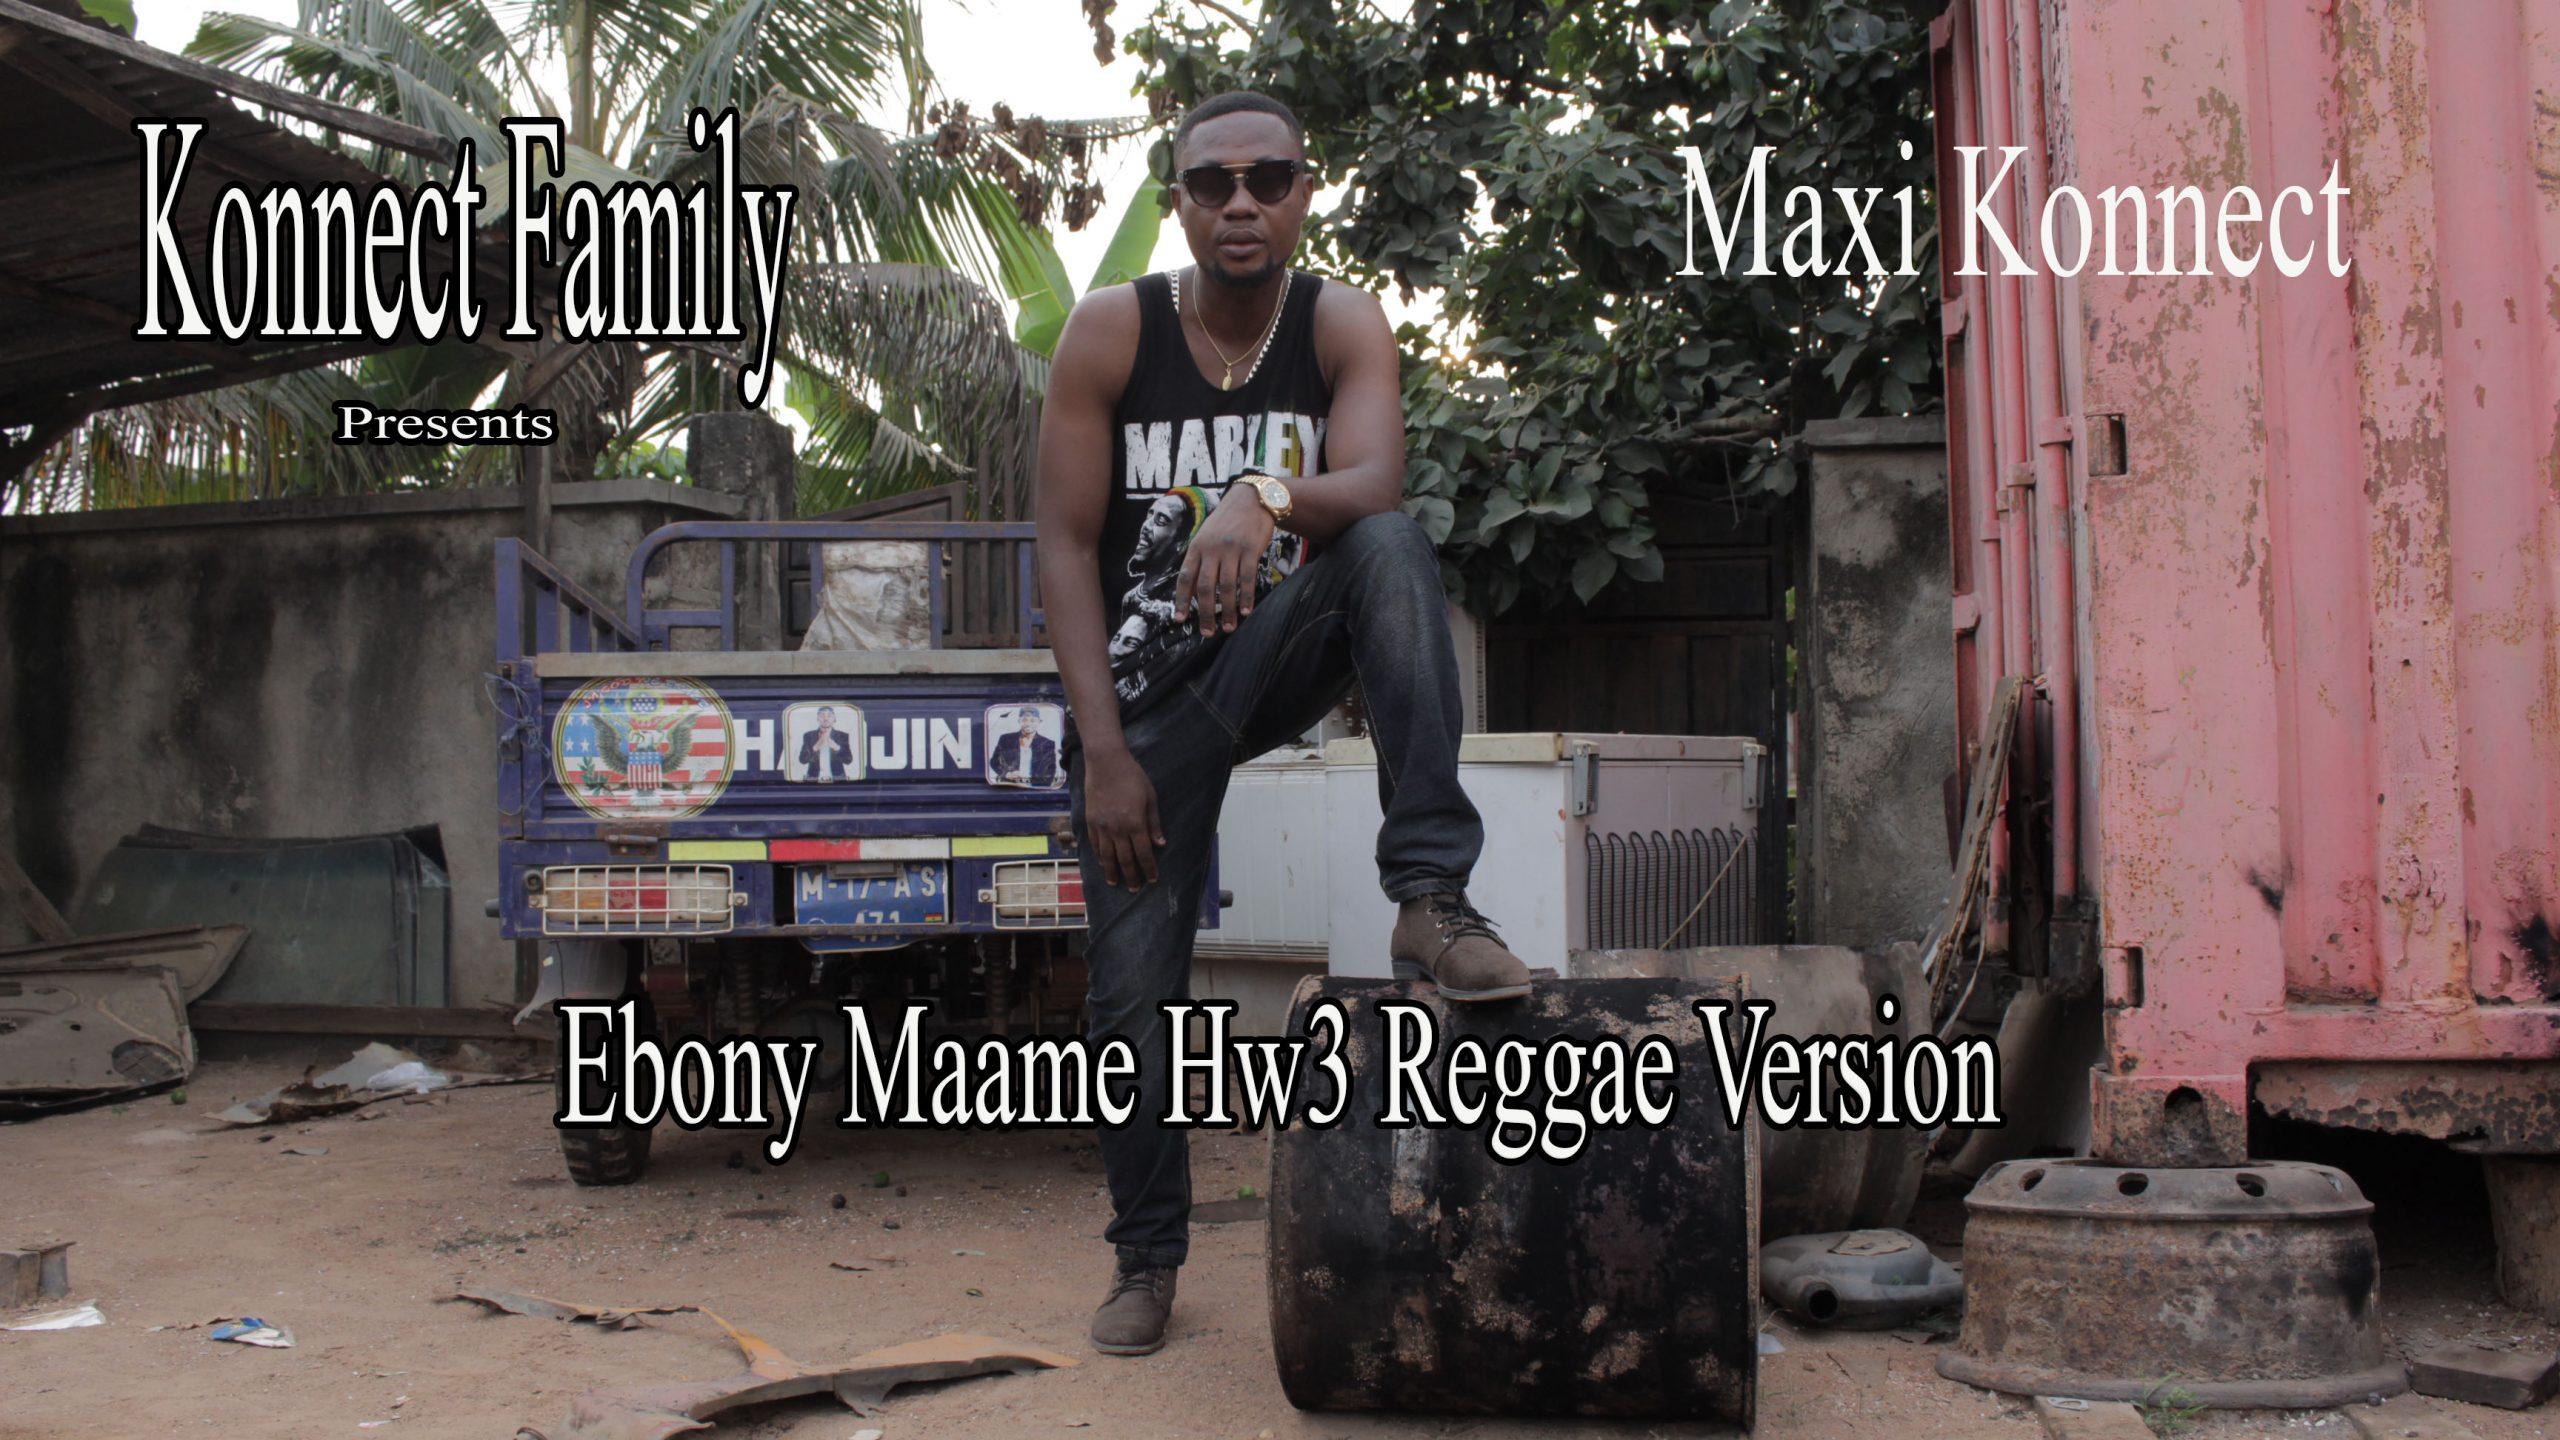 Maxi Konnect – Ebony Maame Hw3 (Reggae Version)